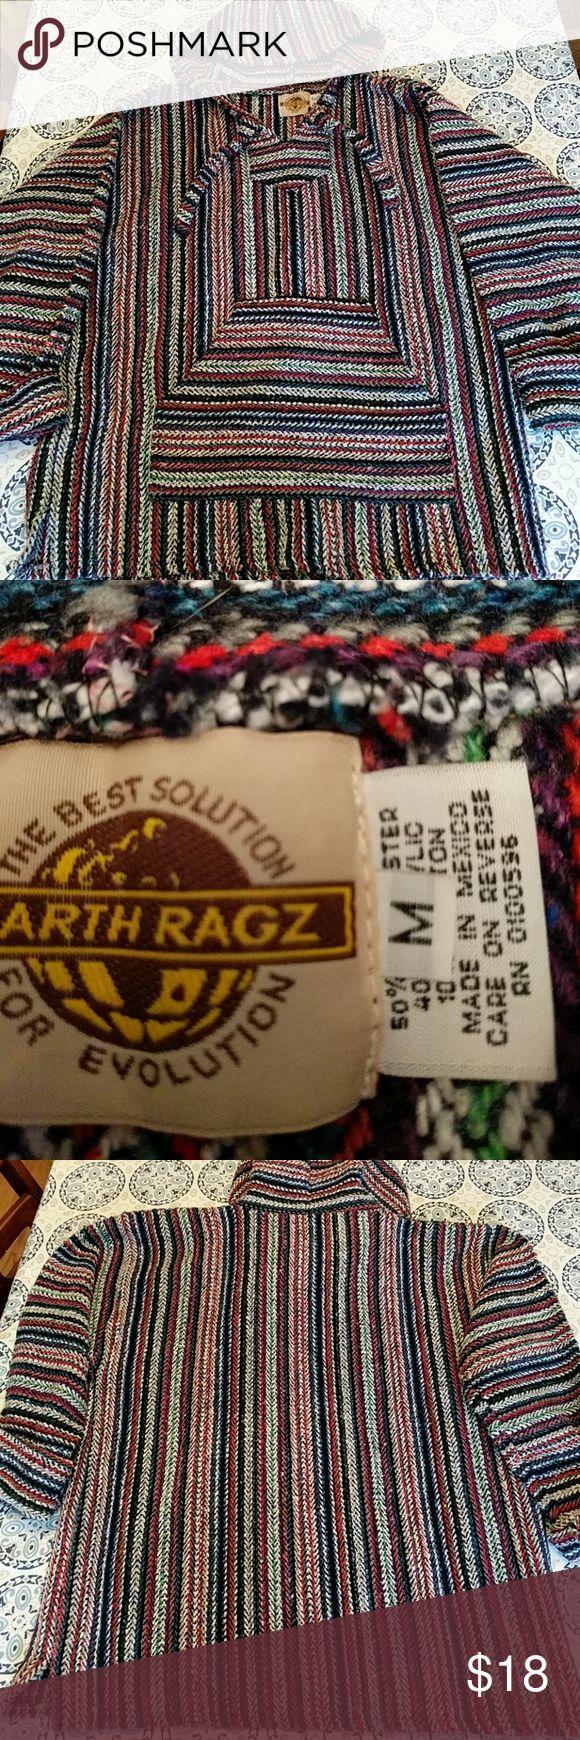 Earth ragz drug rug Earth ragz drug rug multi color earth ragz Tops Sweatshirts & Hoodies